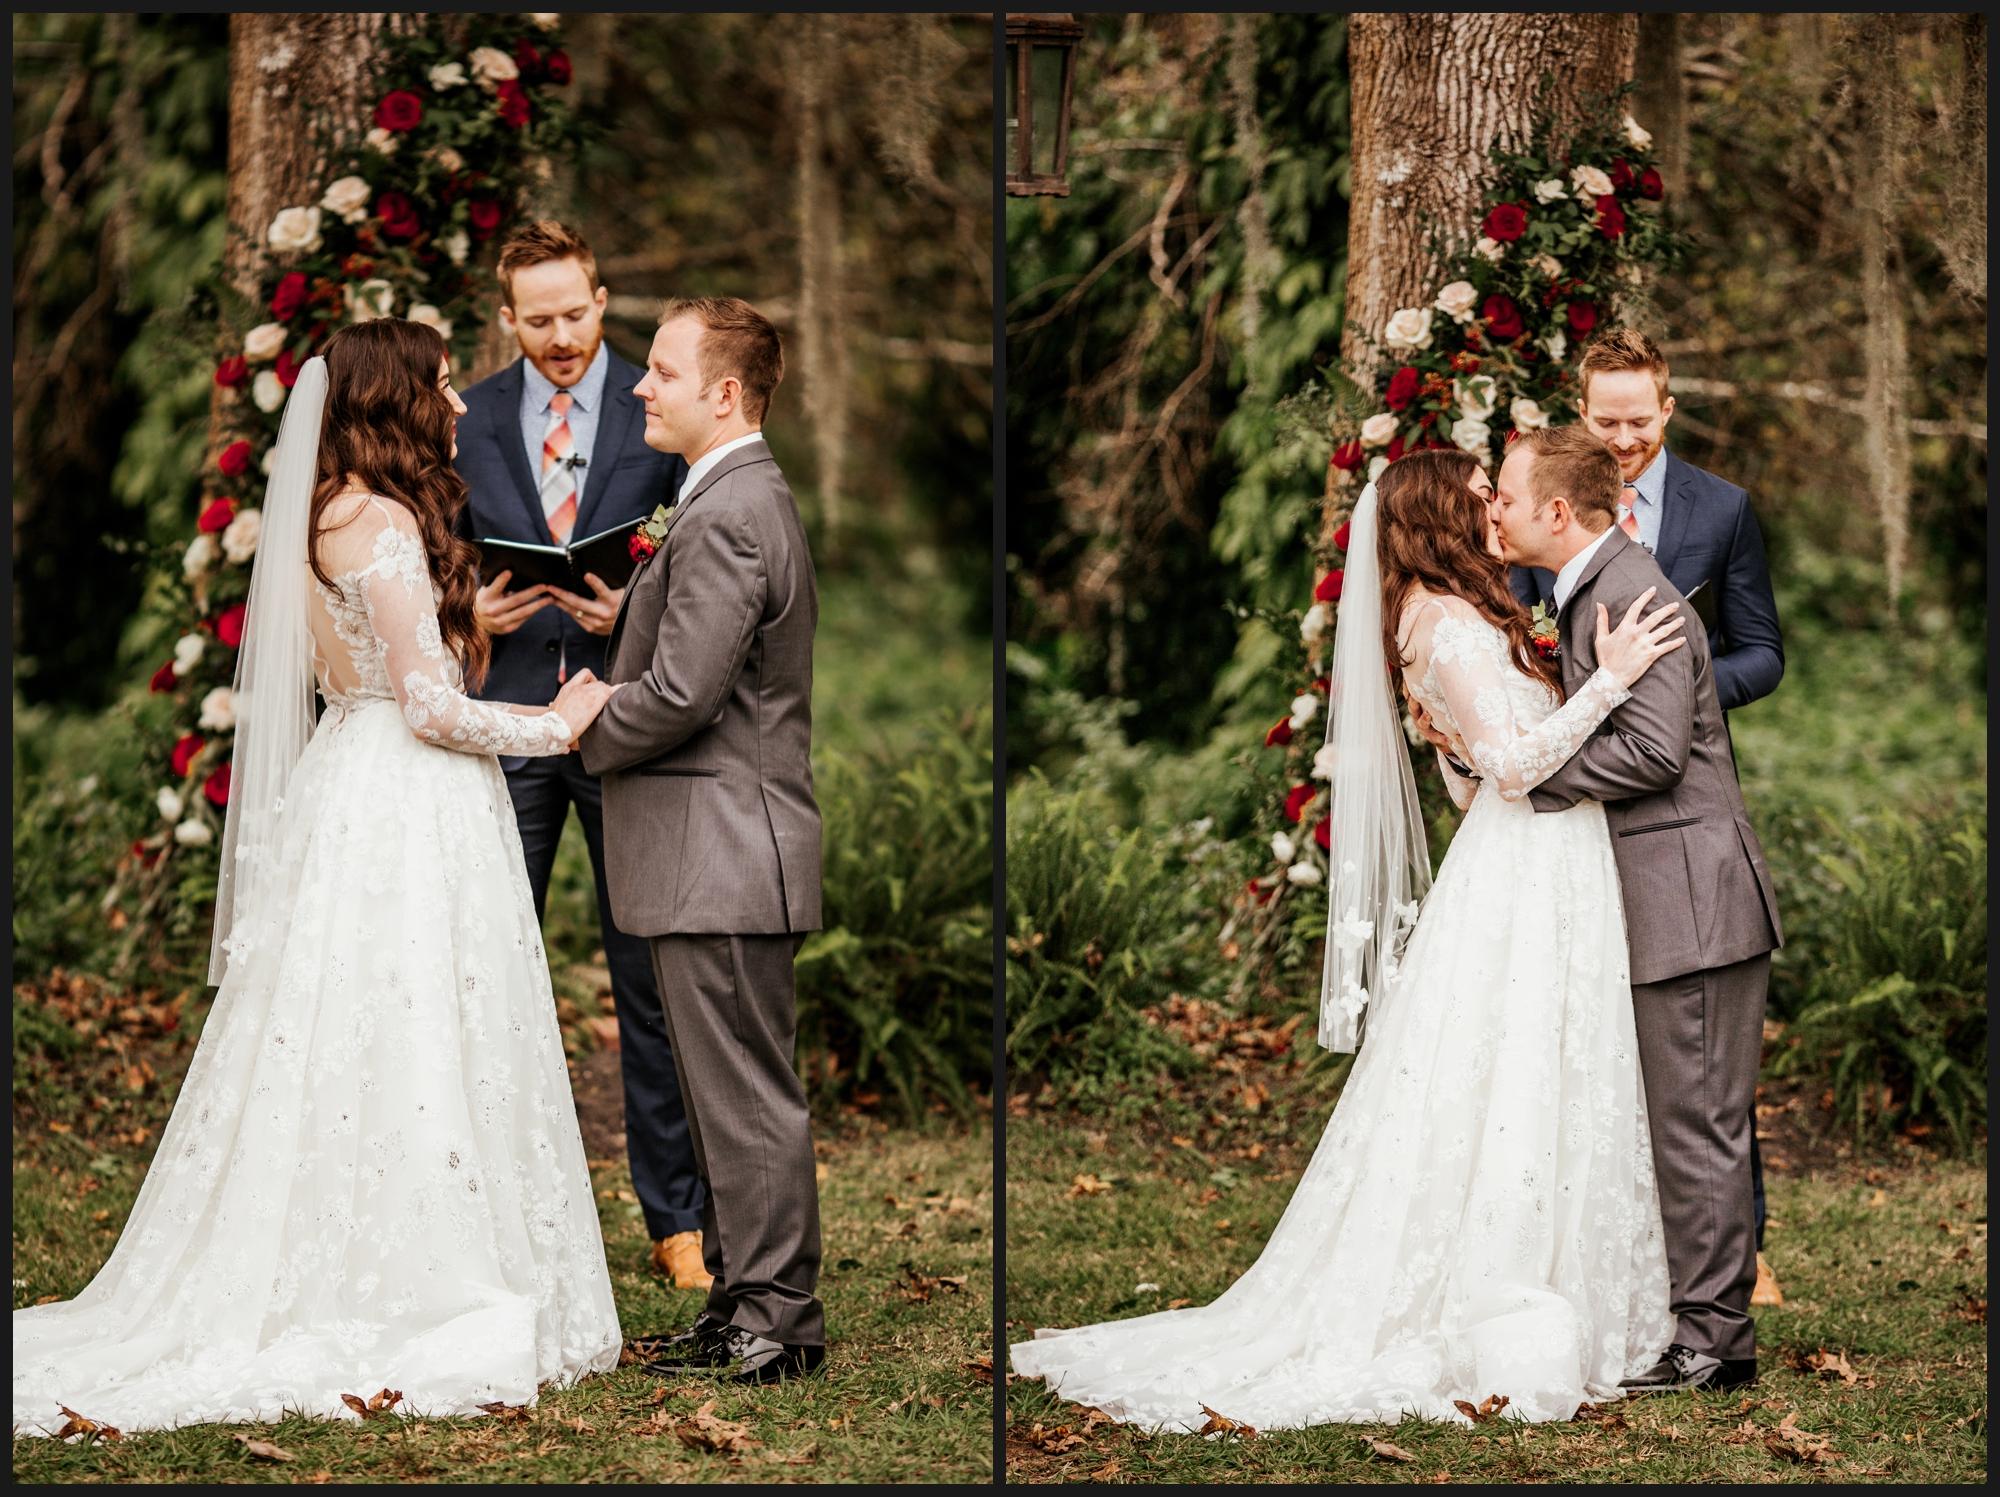 Orlando-Wedding-Photographer-destination-wedding-photographer-florida-wedding-photographer-hawaii-wedding-photographer_0480.jpg